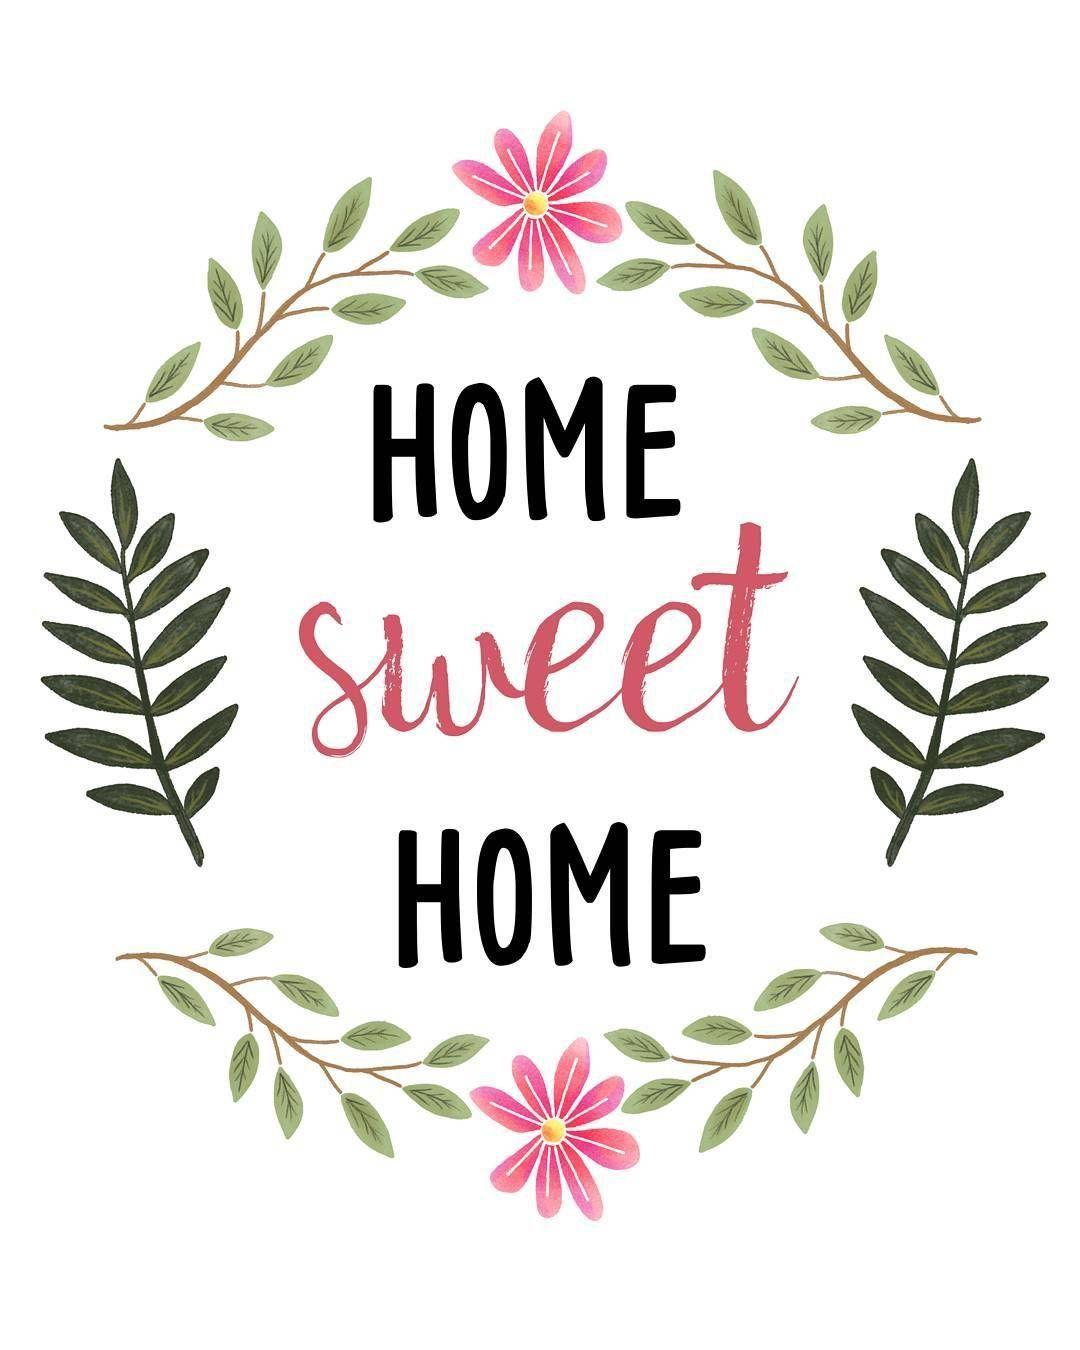 home sweet home home decor ideas projects pinterest rh pinterest com